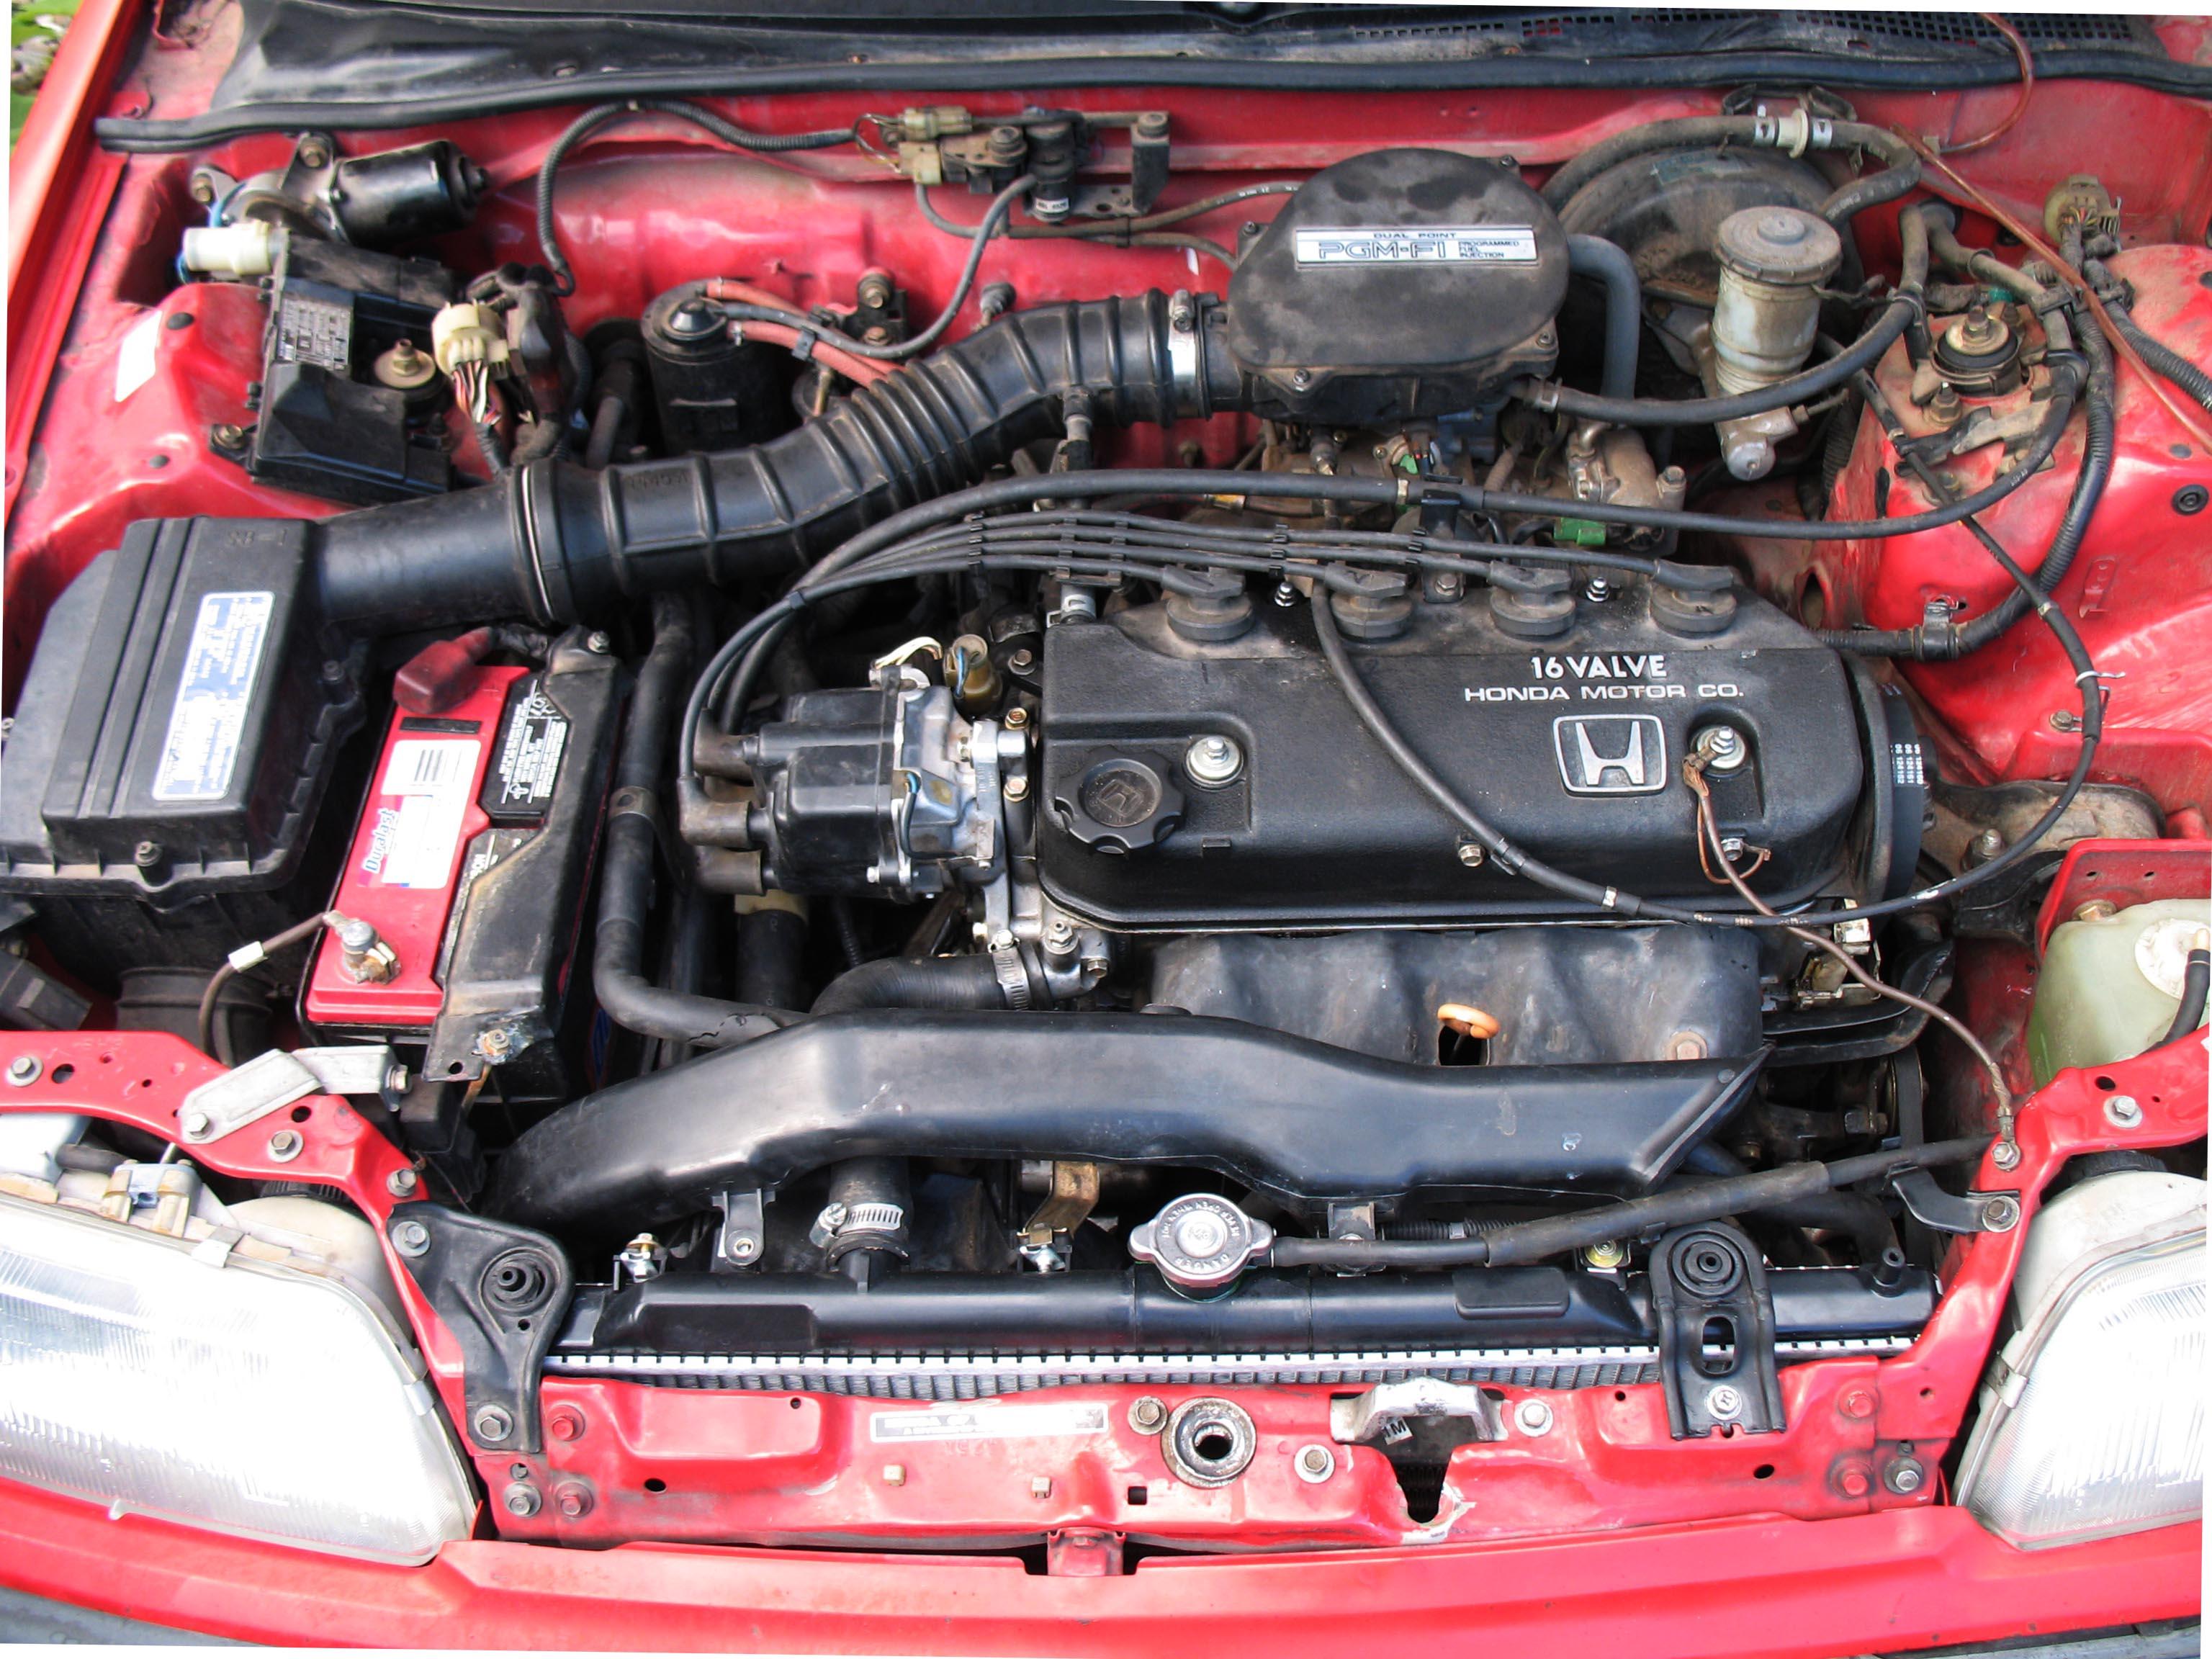 91 accord engine head diagram wiring library91 accord engine head diagram [ 3072 x 2304 Pixel ]